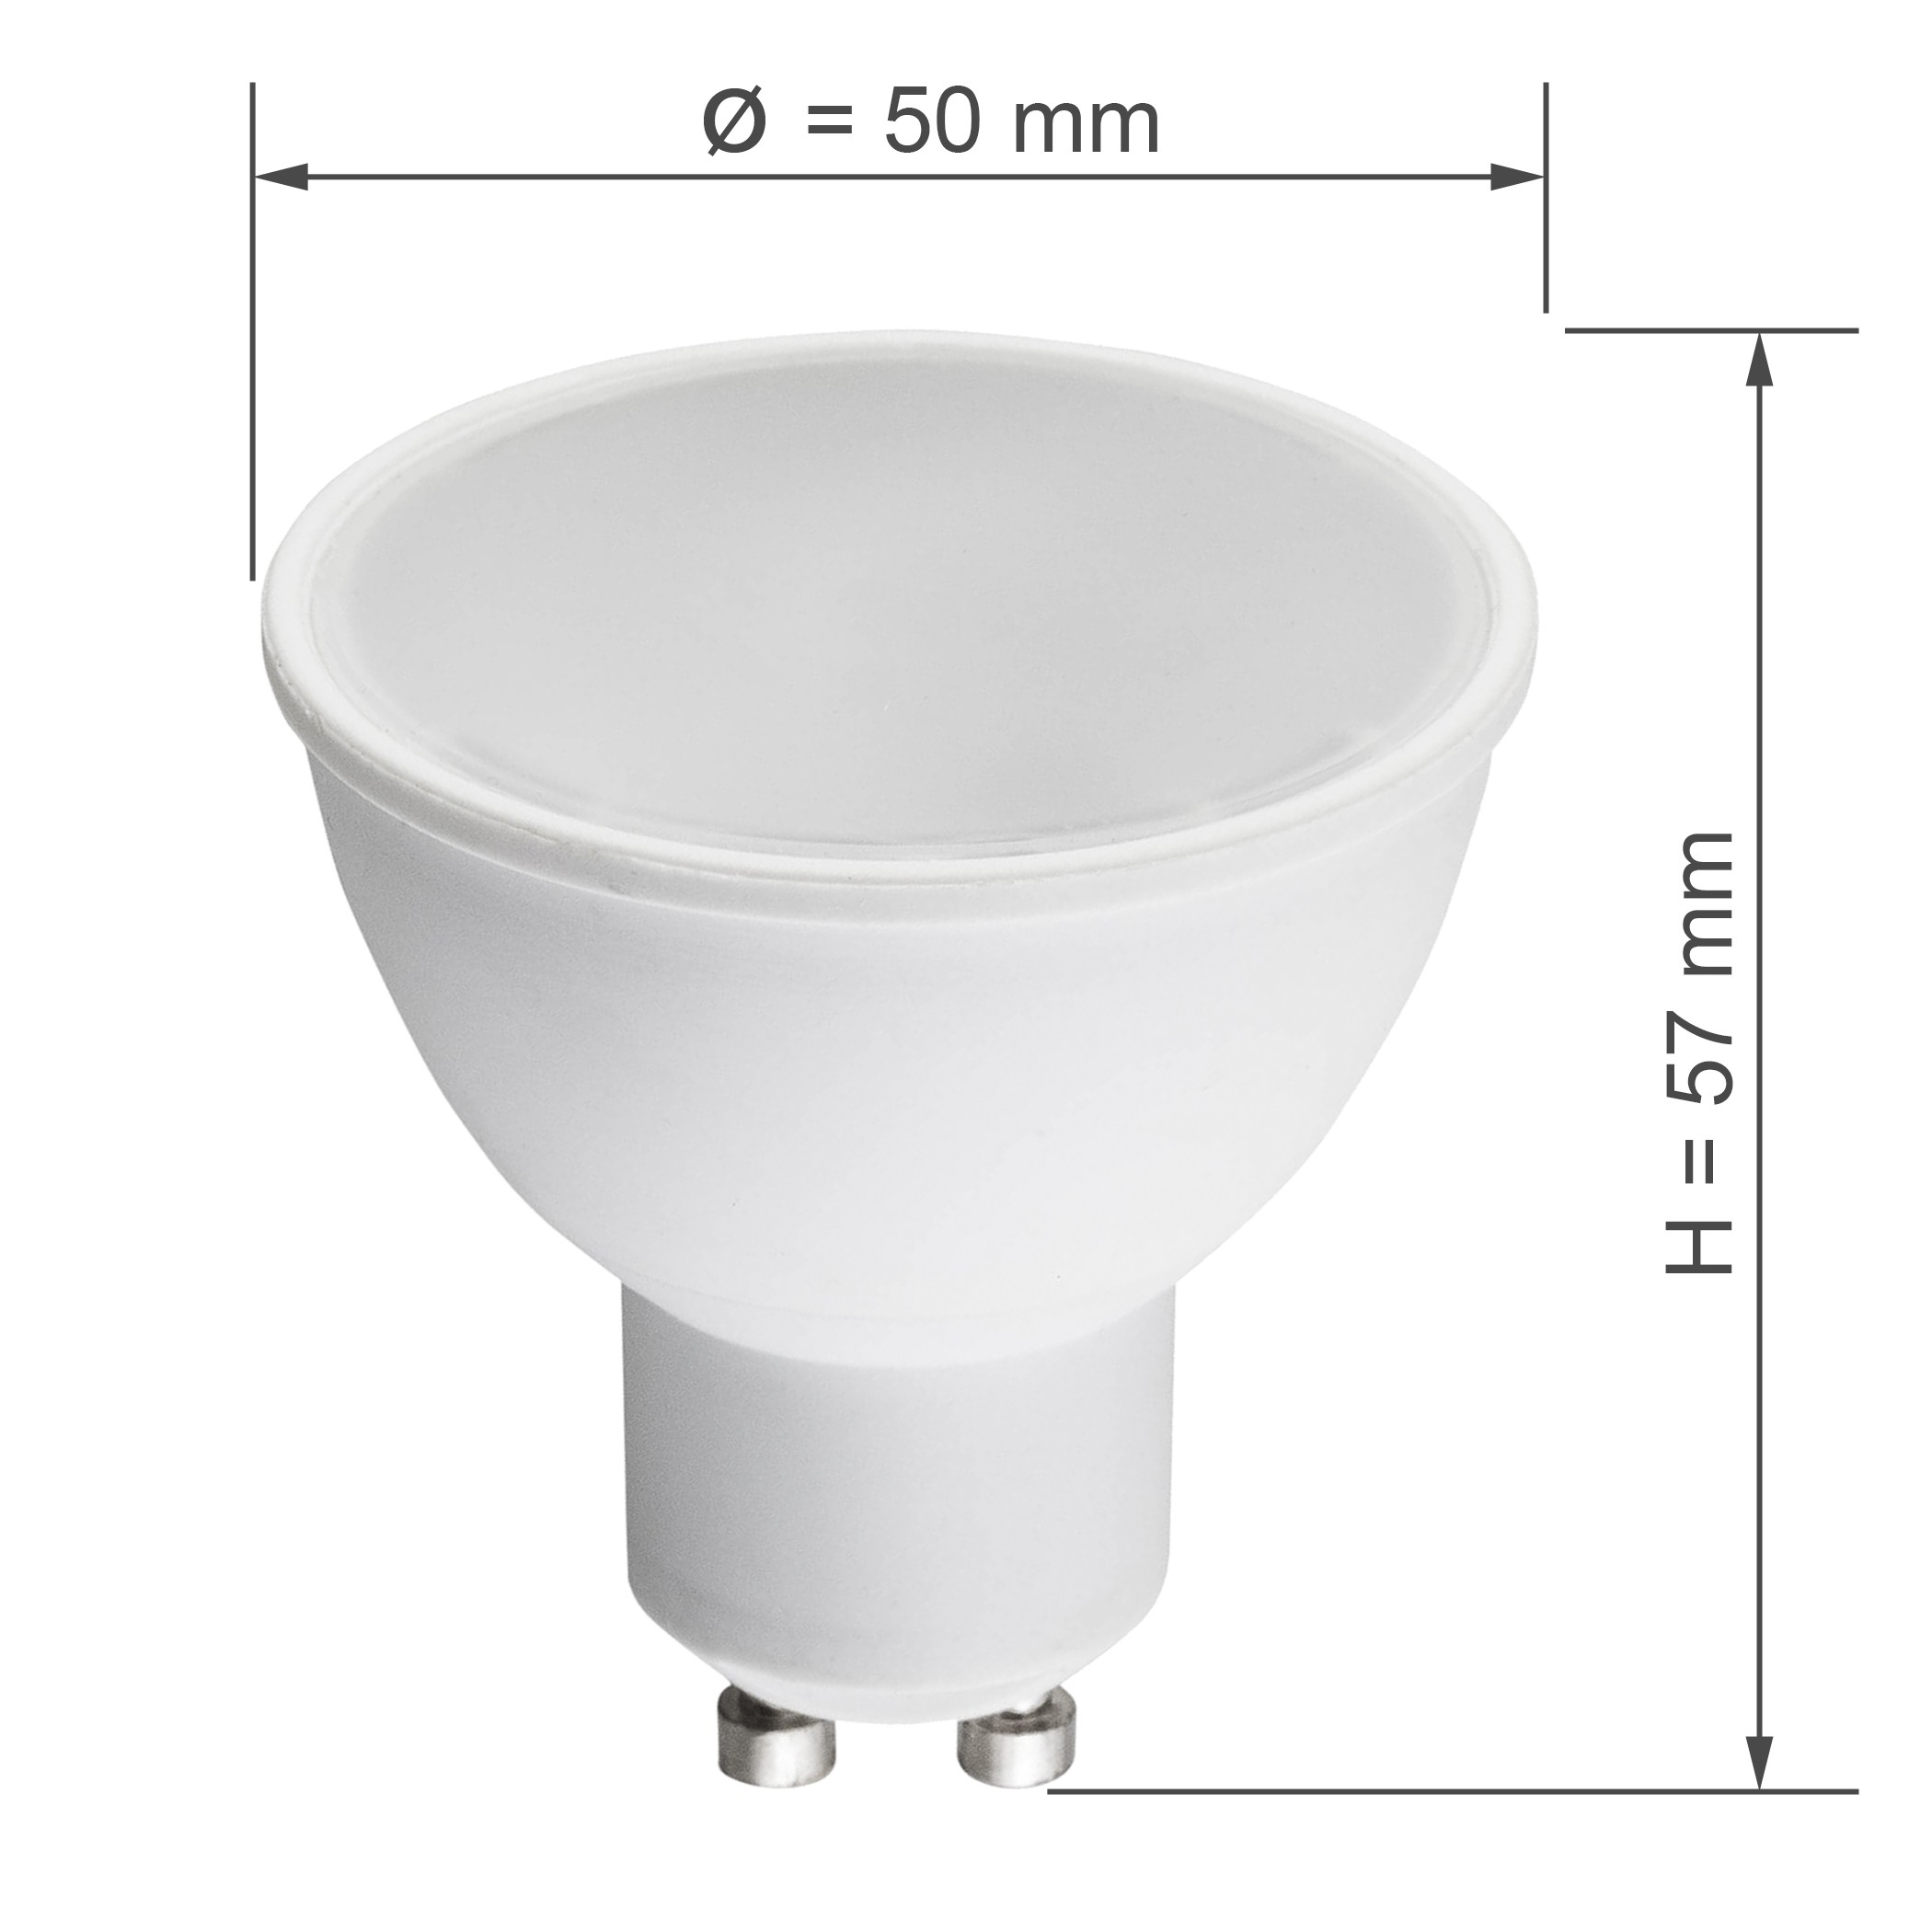 led lampen gu10 rgb farbwechsel bunt dimmbar 4 modi fernbedienung sebson. Black Bedroom Furniture Sets. Home Design Ideas